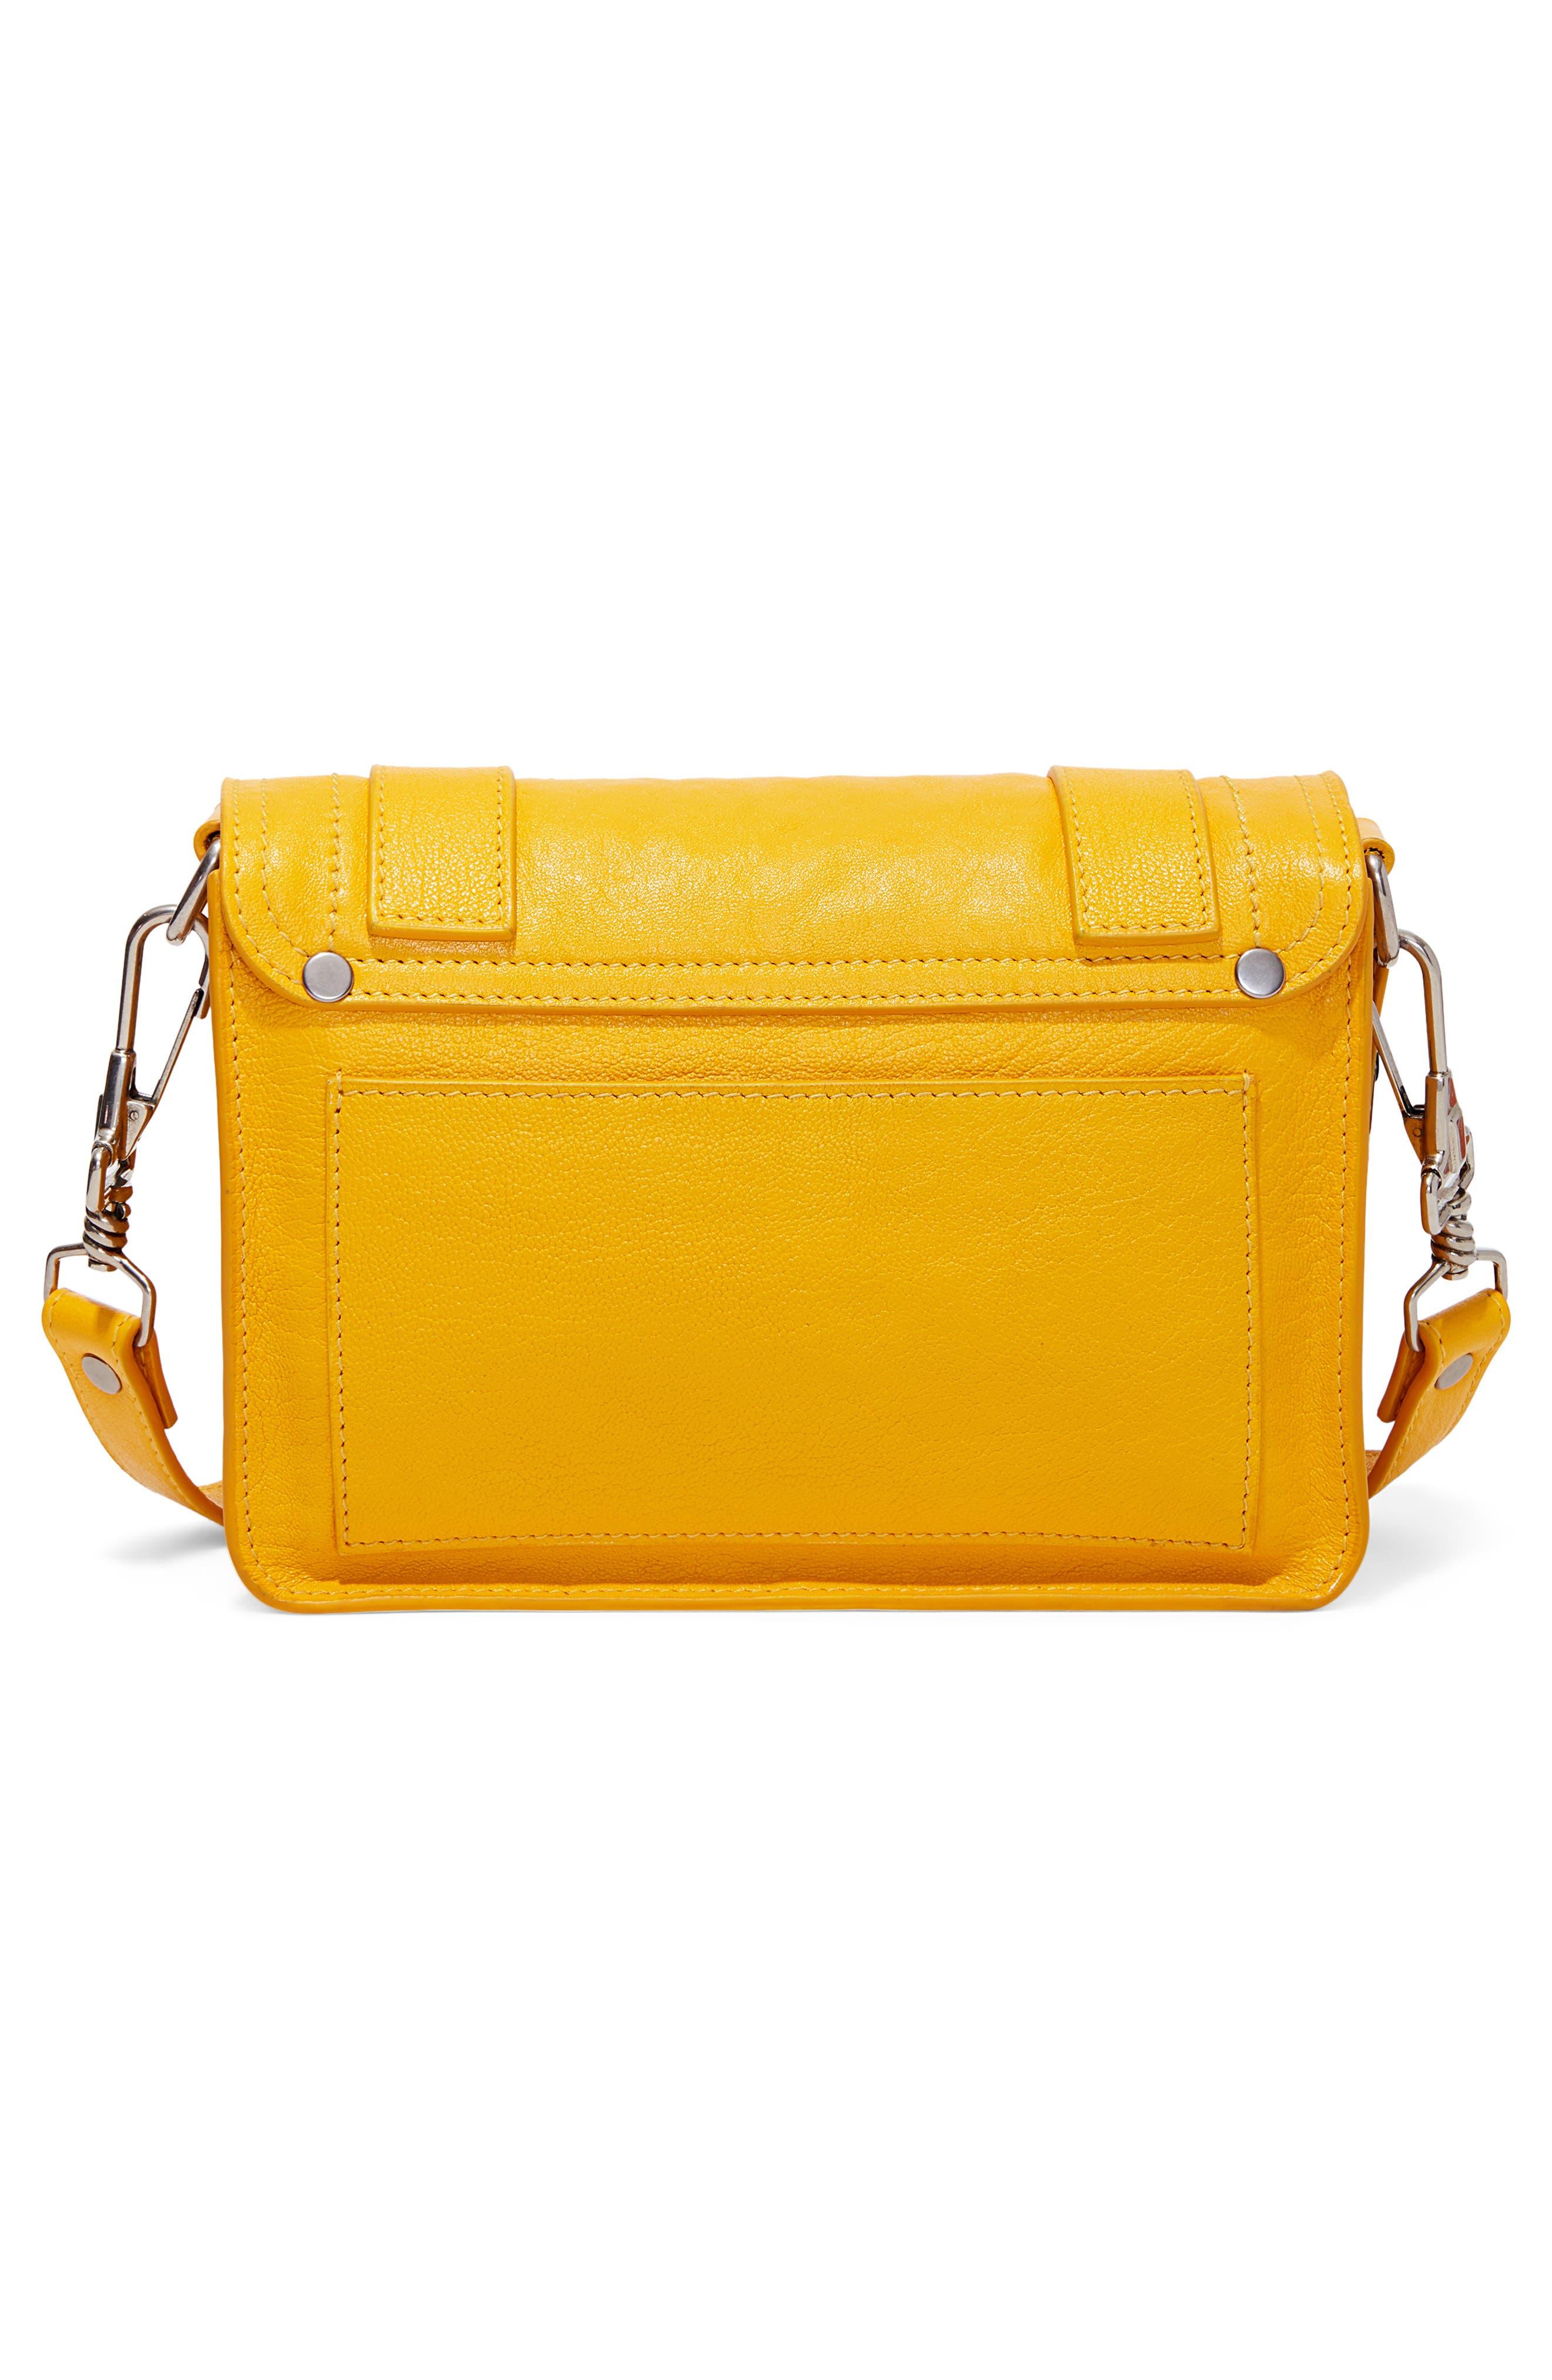 PROENZA SCHOULER, 'Mini PS1' Lambskin Leather Crossbody Bag, Alternate thumbnail 3, color, LEMON CHROME